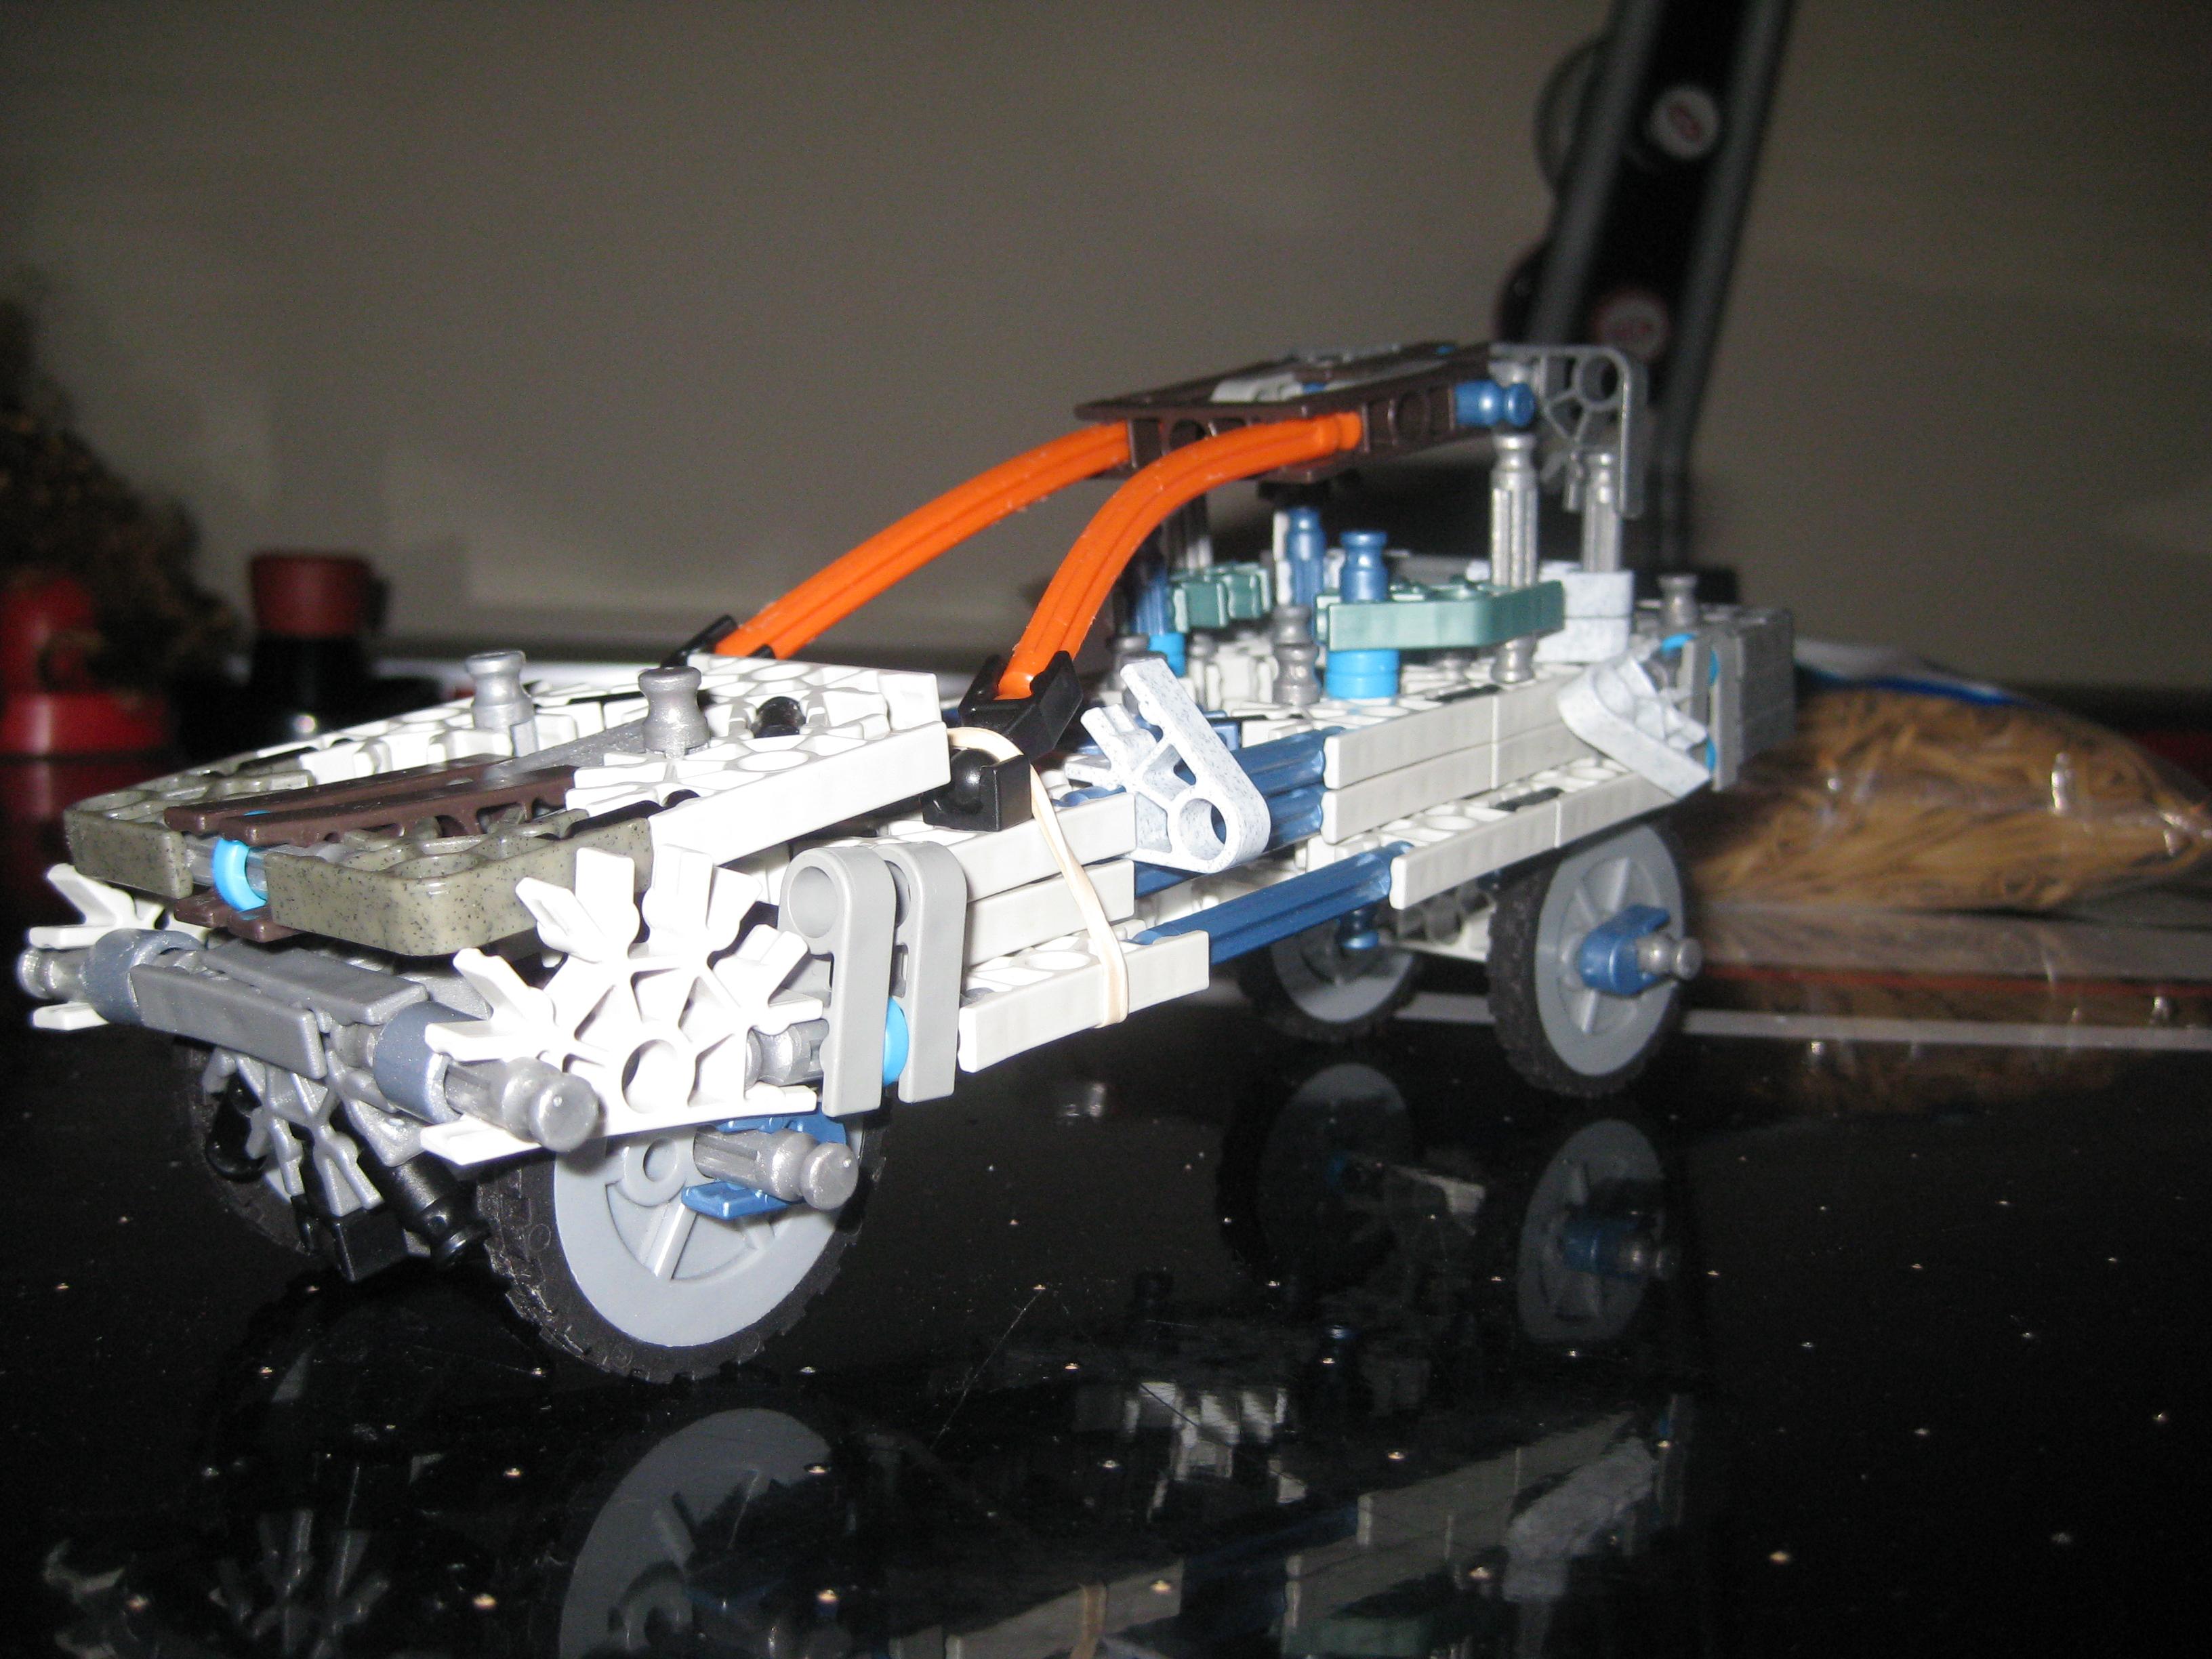 Picture of K'nex Car (TNKIT Entry)